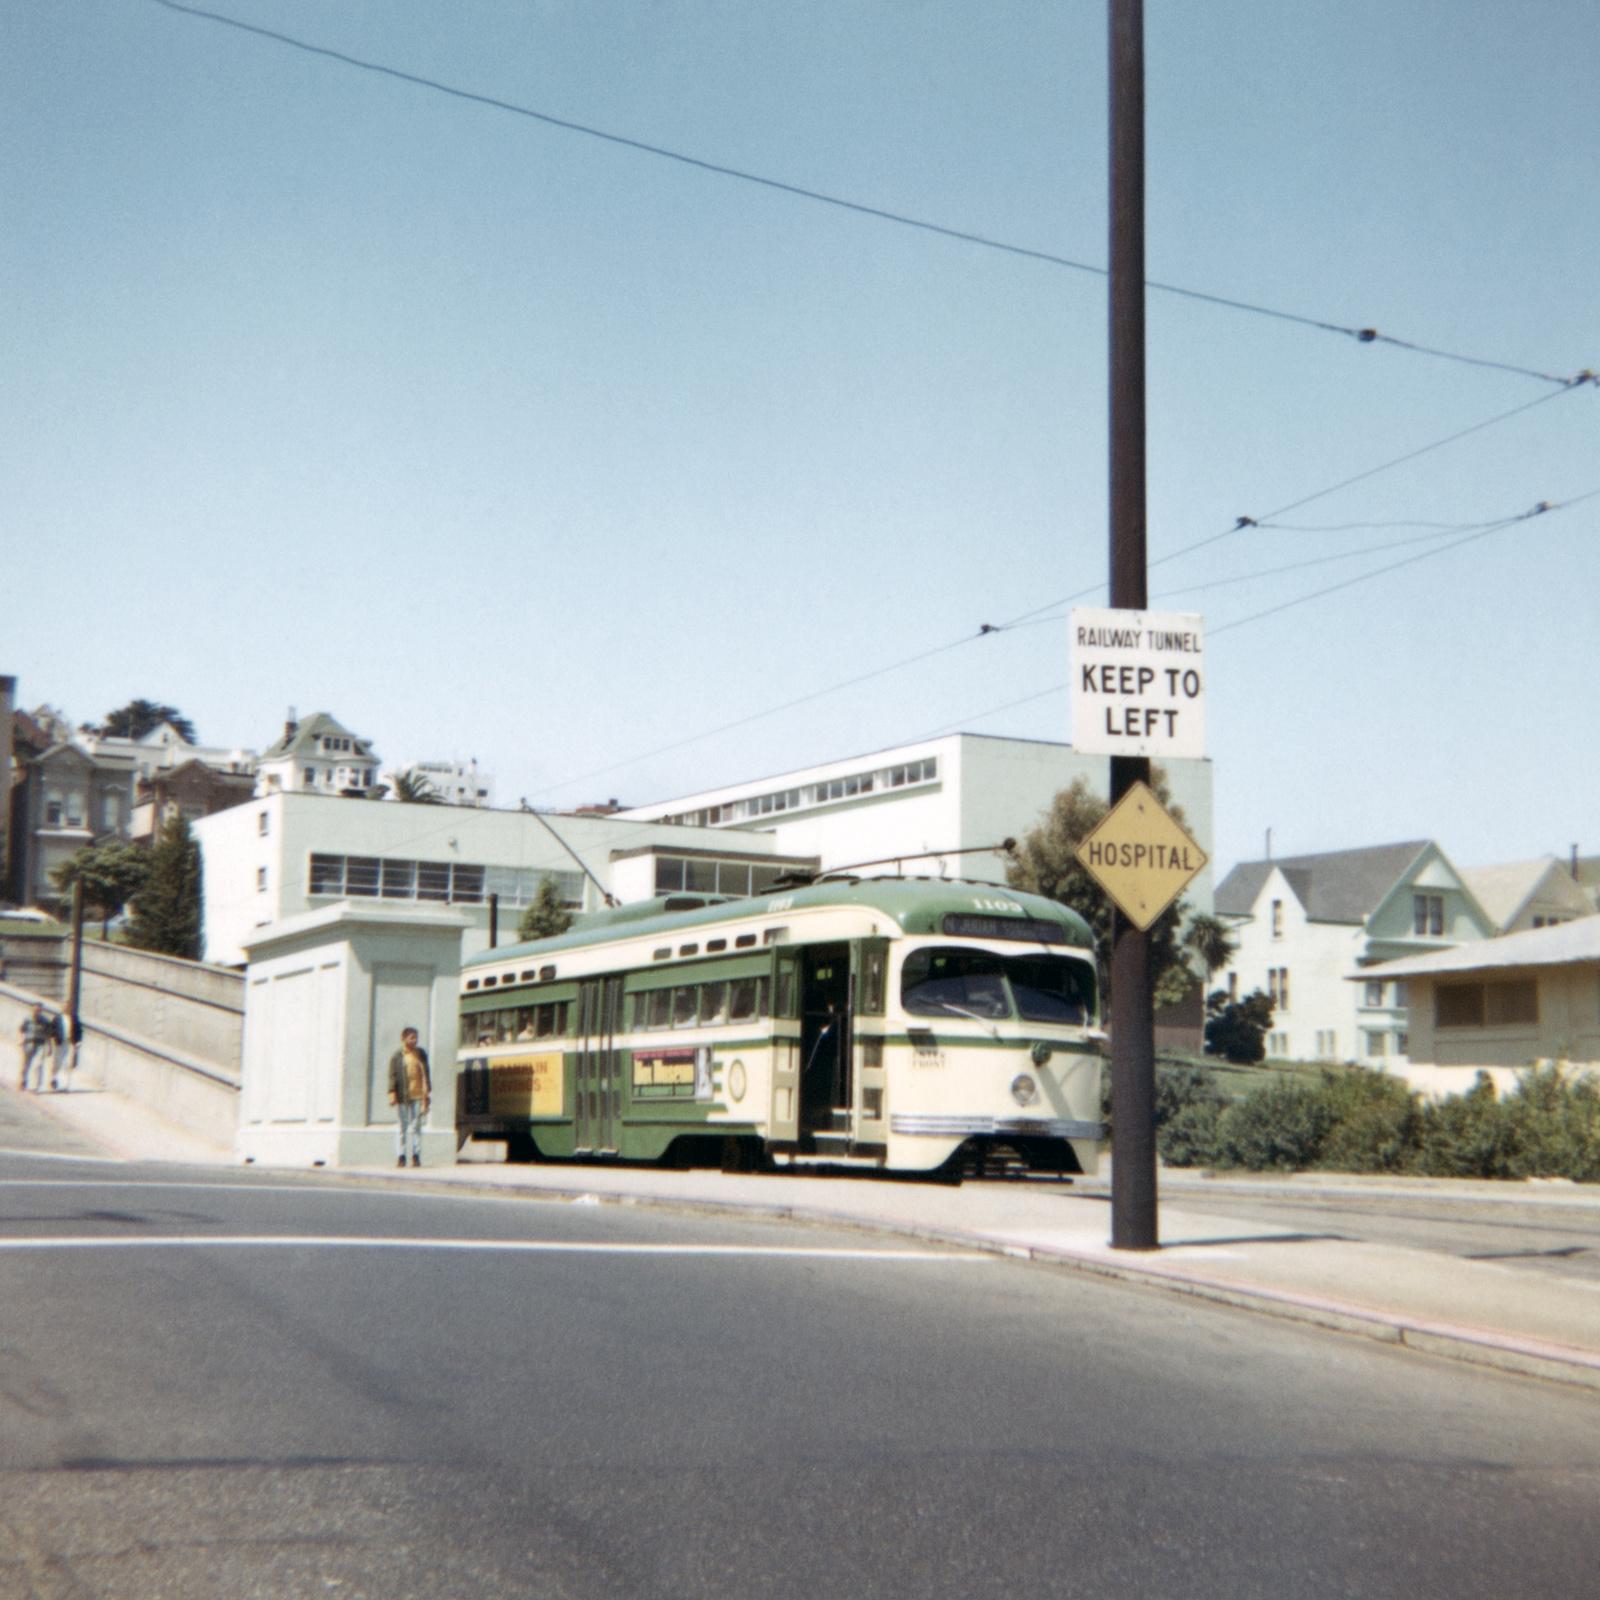 (449k, 1041x1044)<br><b>Country:</b> United States<br><b>City:</b> San Francisco/Bay Area, CA<br><b>System:</b> SF MUNI<br><b>Line:</b> MUNI Metro (N-Judah)<br><b>Location:</b> Sunset Tunnel East Portal <br><b>Route:</b> N-Judah<br><b>Car:</b> SF MUNI PCC St. Louis (St. Louis Car Co, 1946)  1103 <br><b>Photo by:</b> Roberta Hill<br><b>Collection of:</b> David Pirmann<br><b>Date:</b> 8/26/1967<br><b>Viewed (this week/total):</b> 1 / 2589